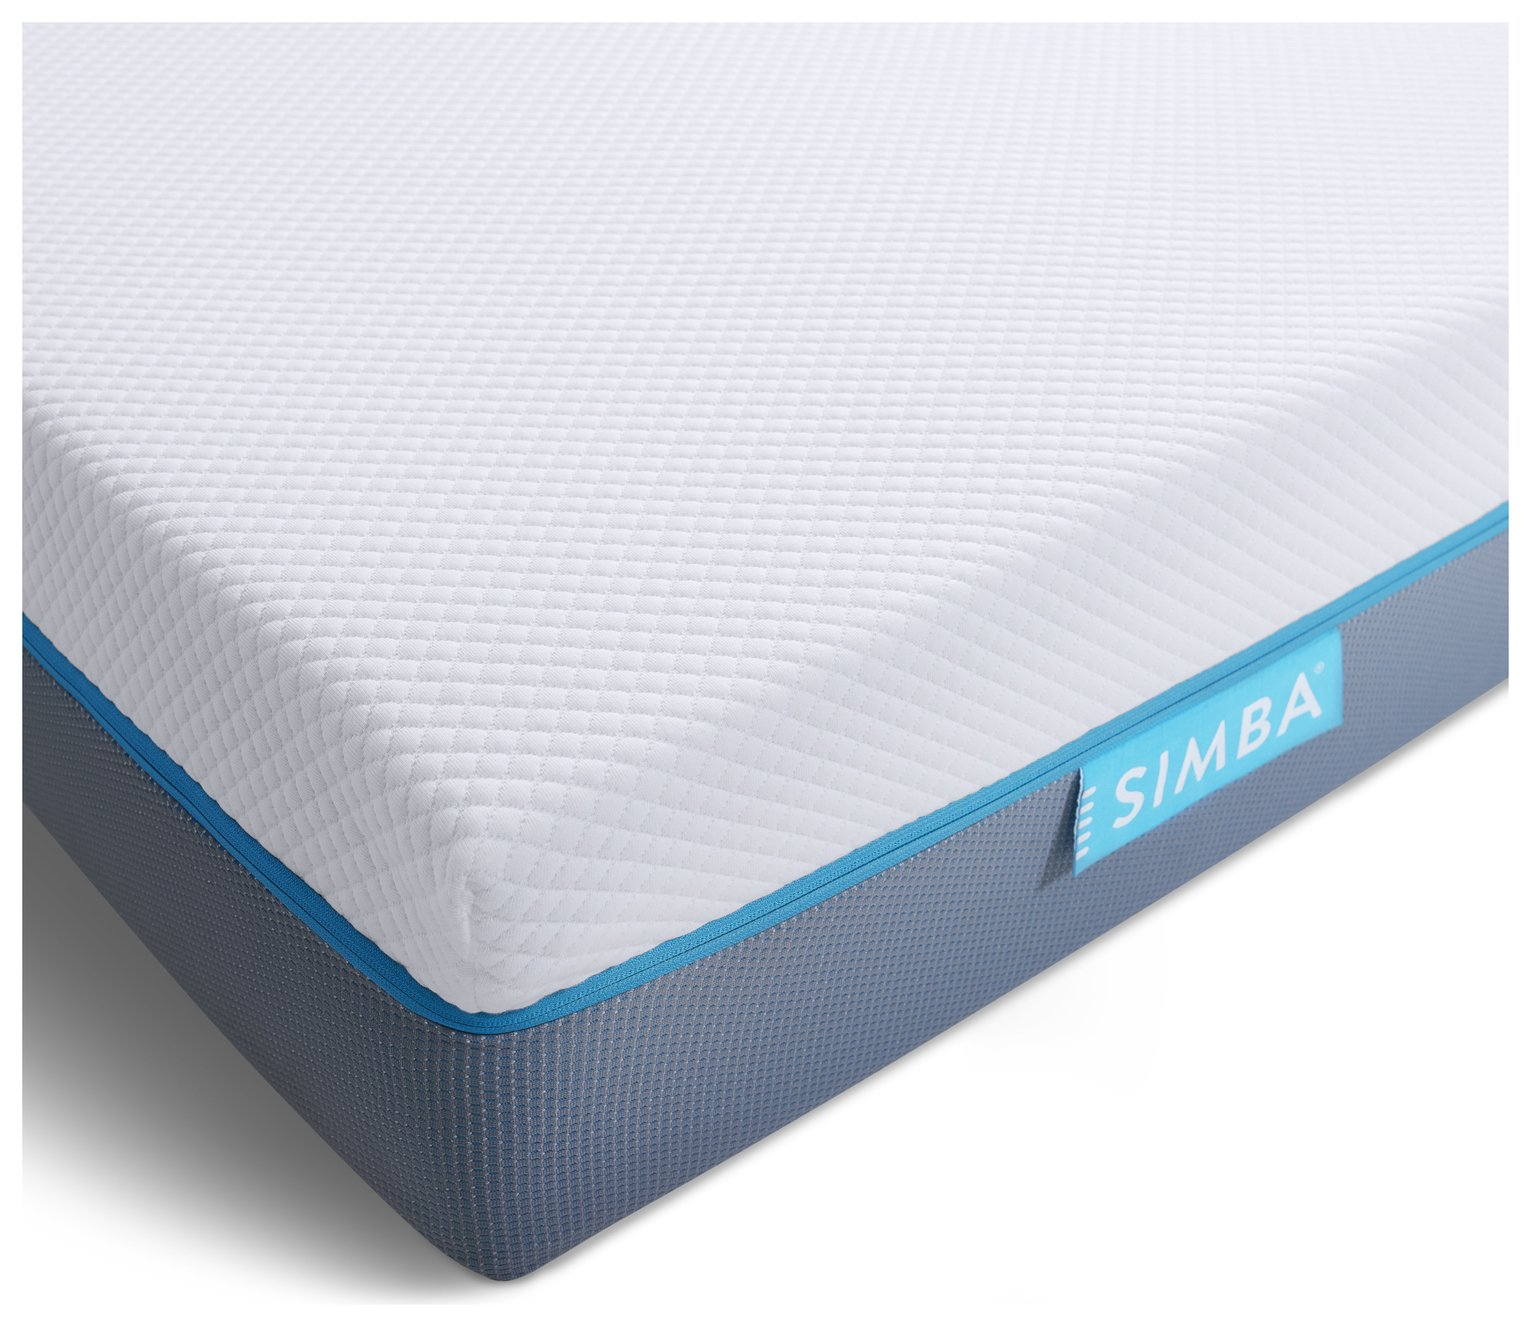 Simba Hybrid Mattress - Single at Argos